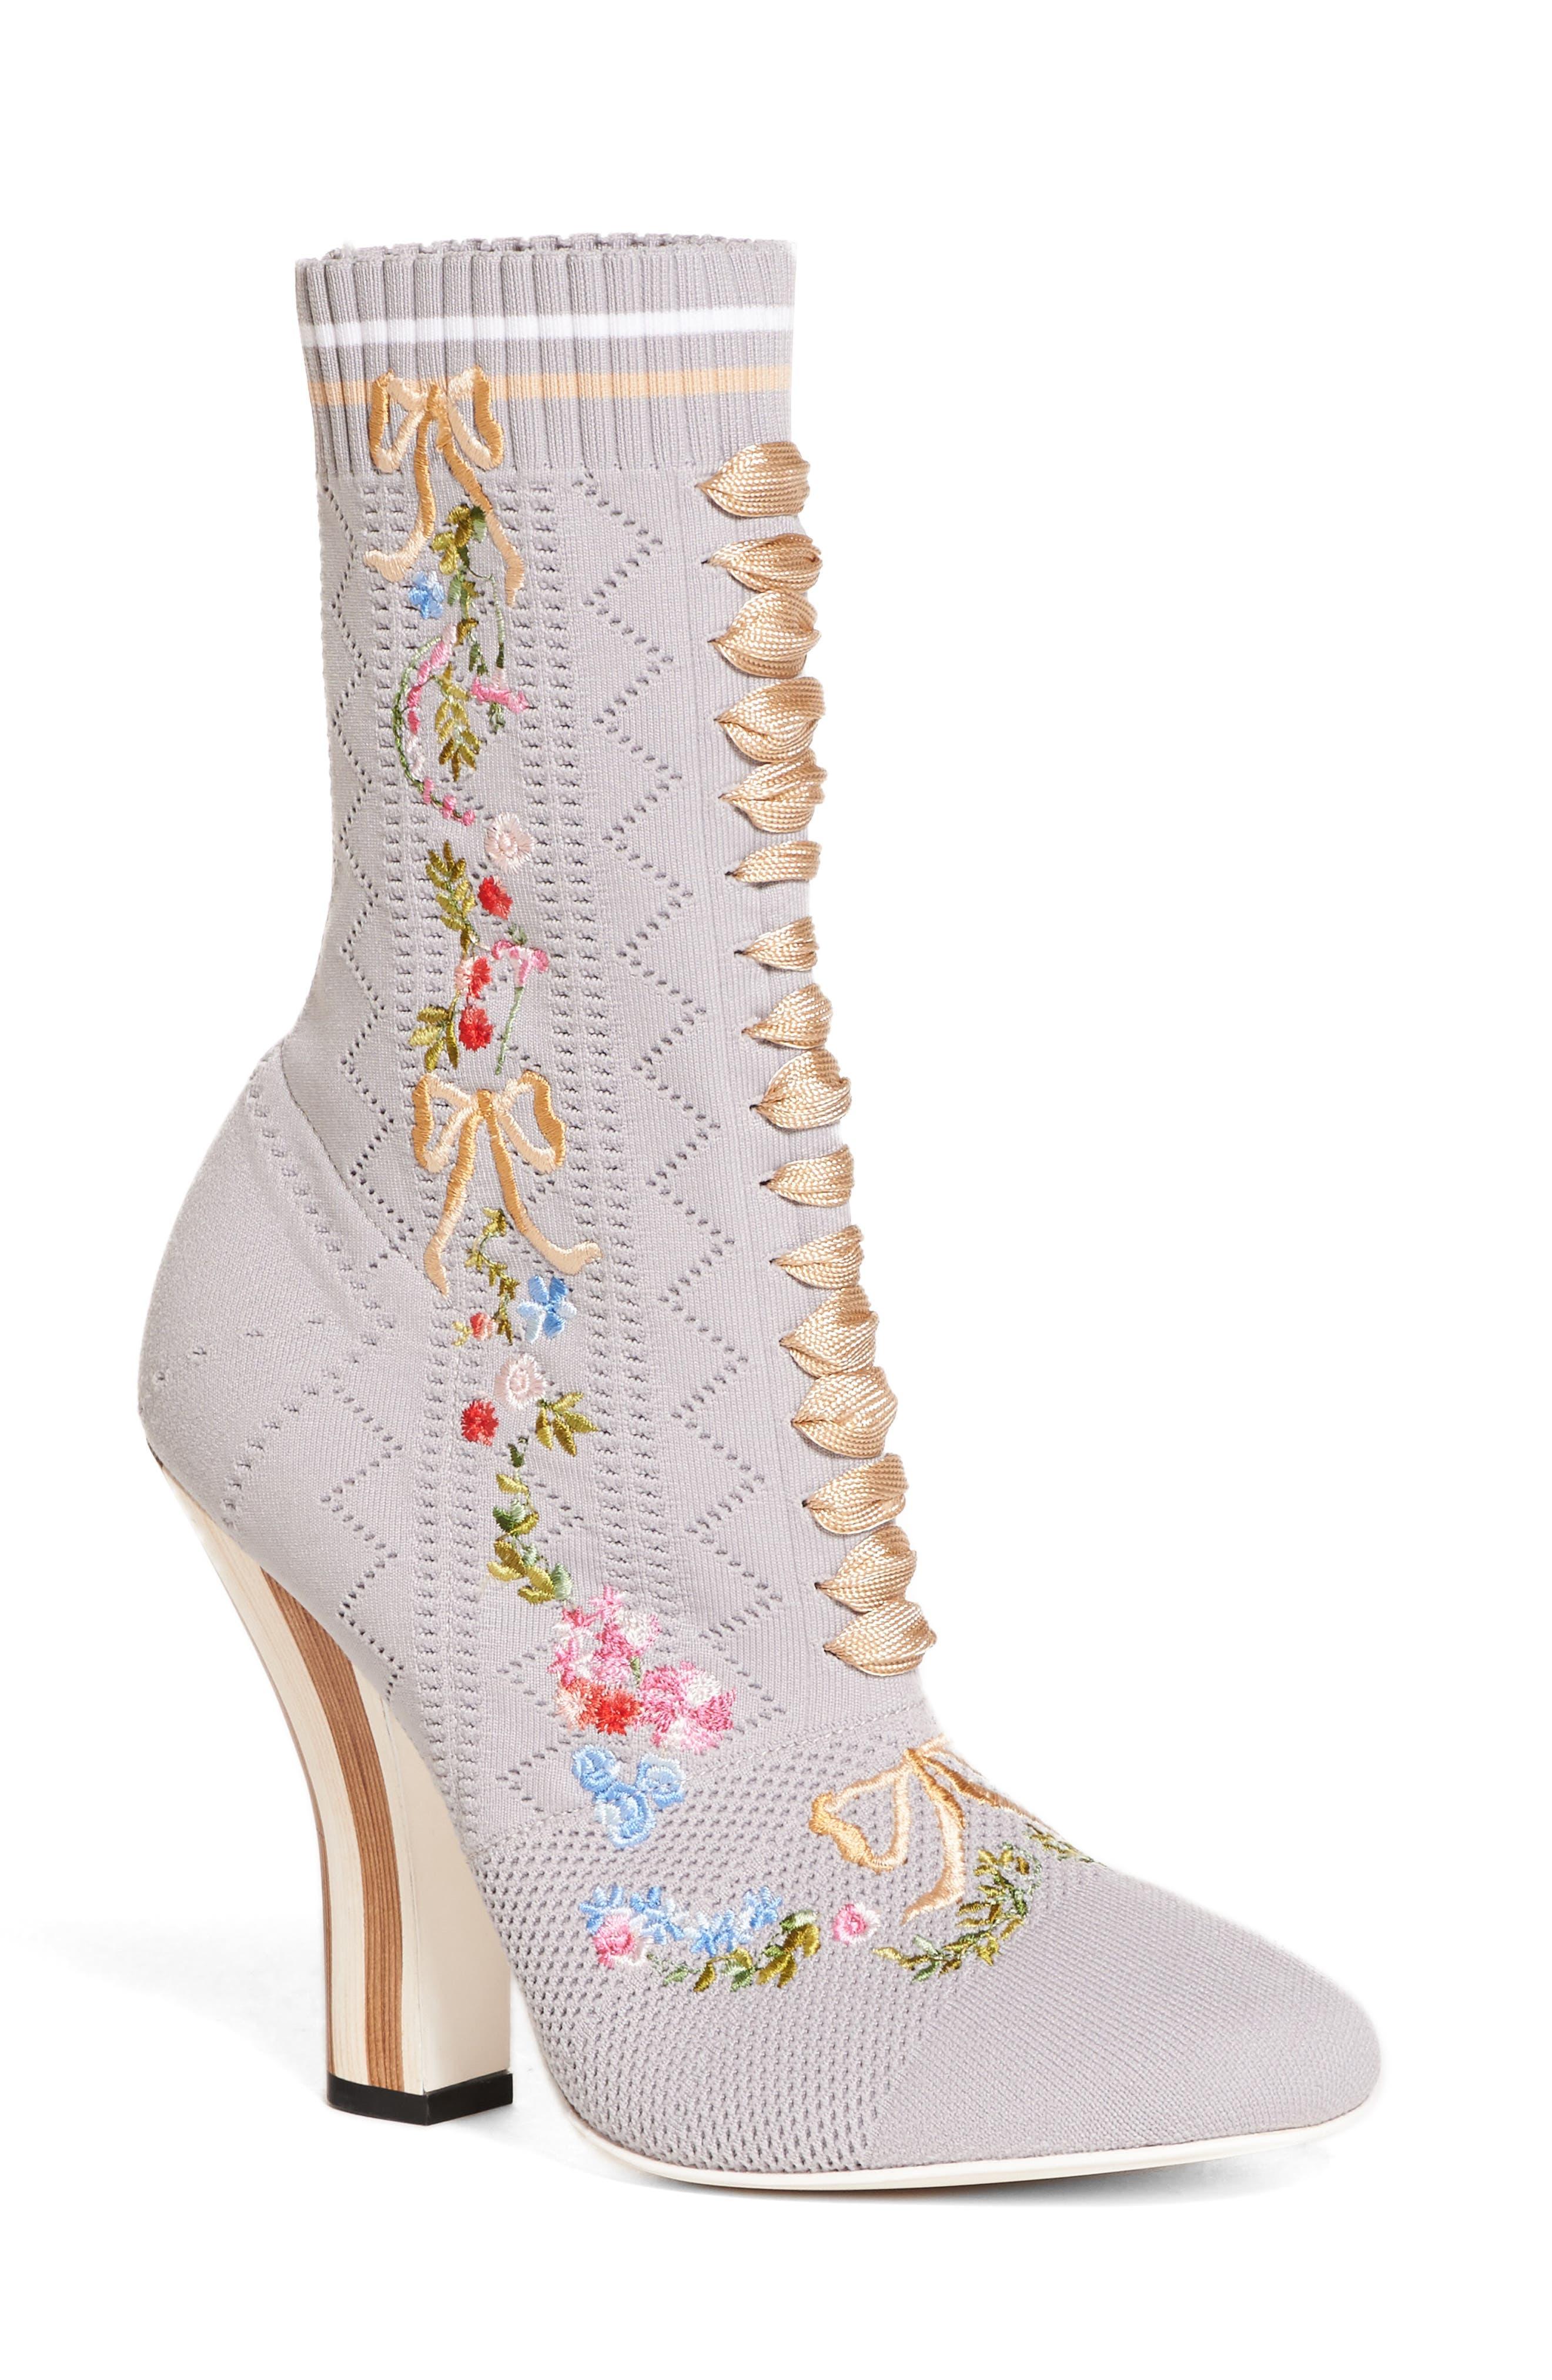 Main Image - Fendi Floral Sock Bootie (Women)